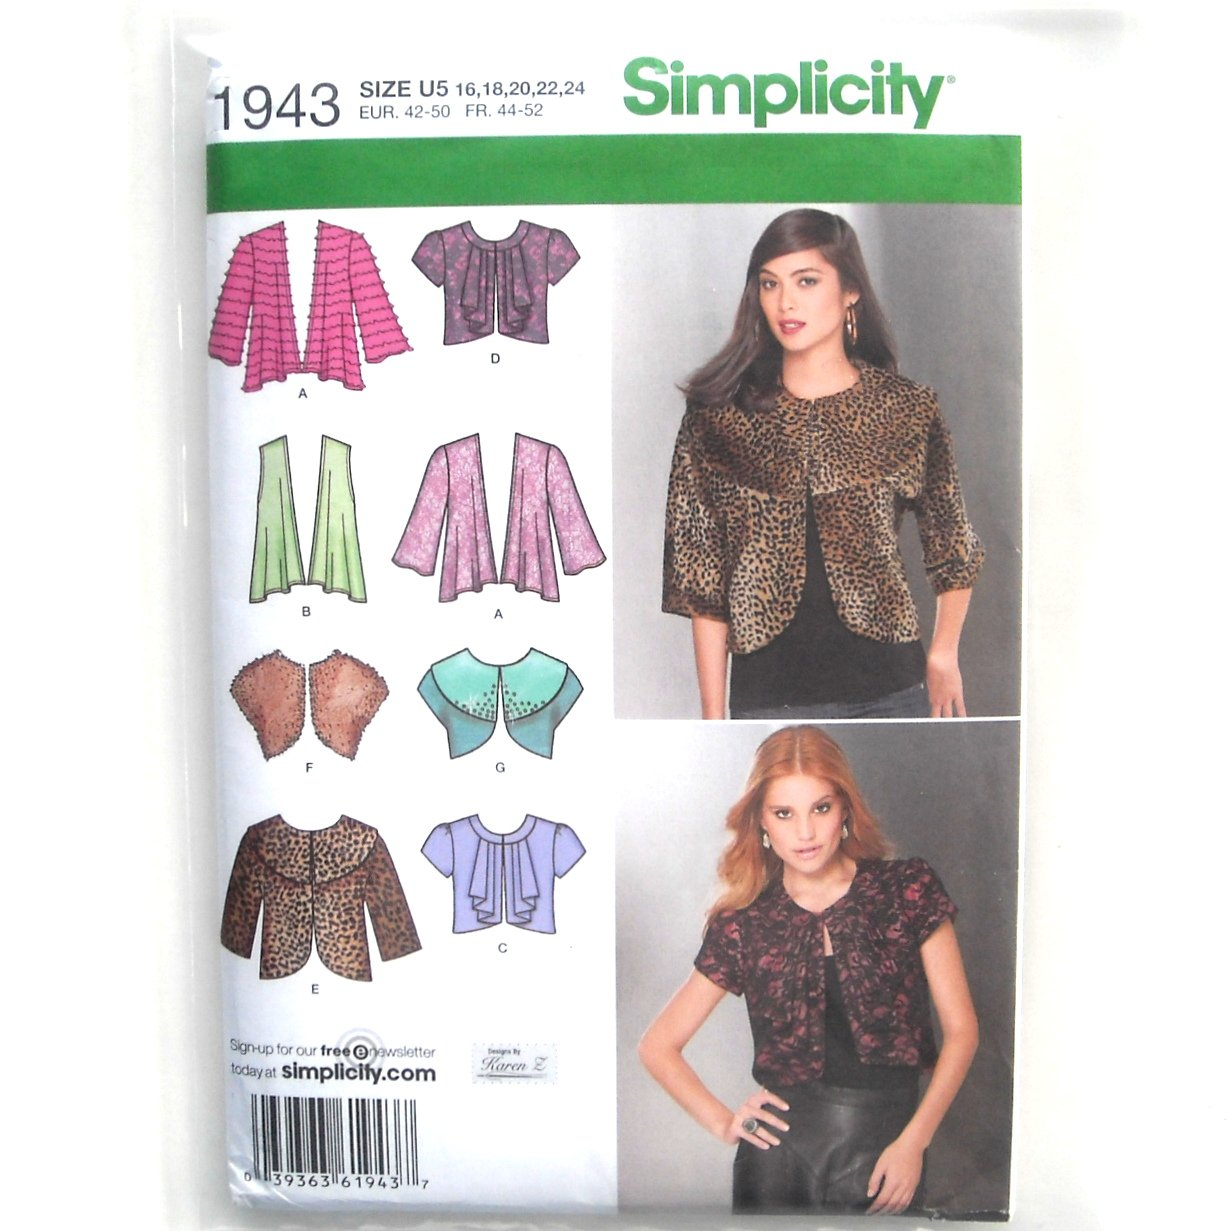 Misses Womens Jackets 16 - 24 Karen Z Designs Simplicity Sewing Pattern 1943